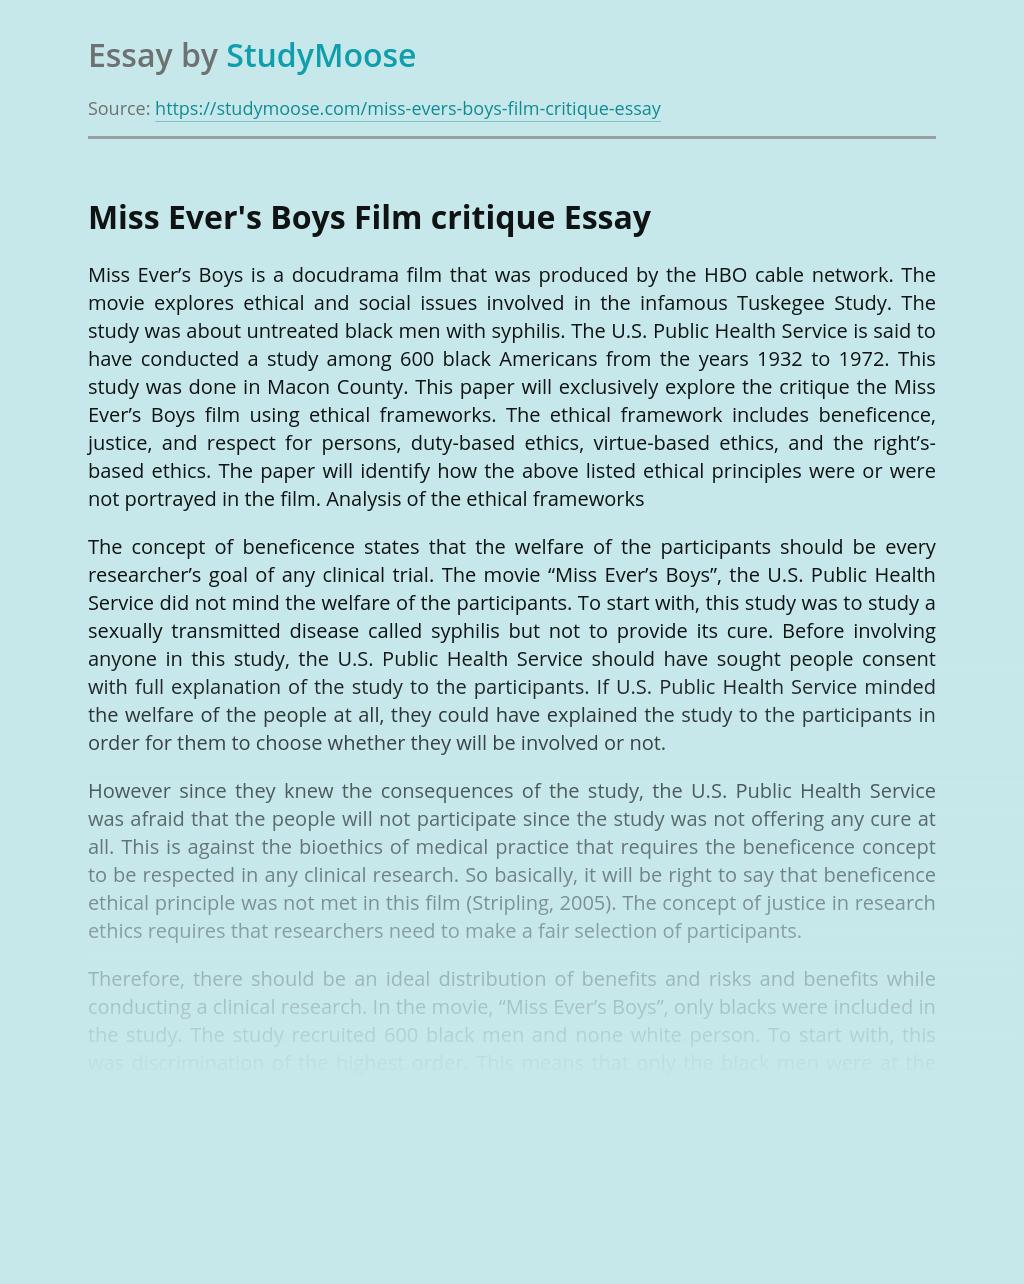 Miss Ever's Boys Film critique